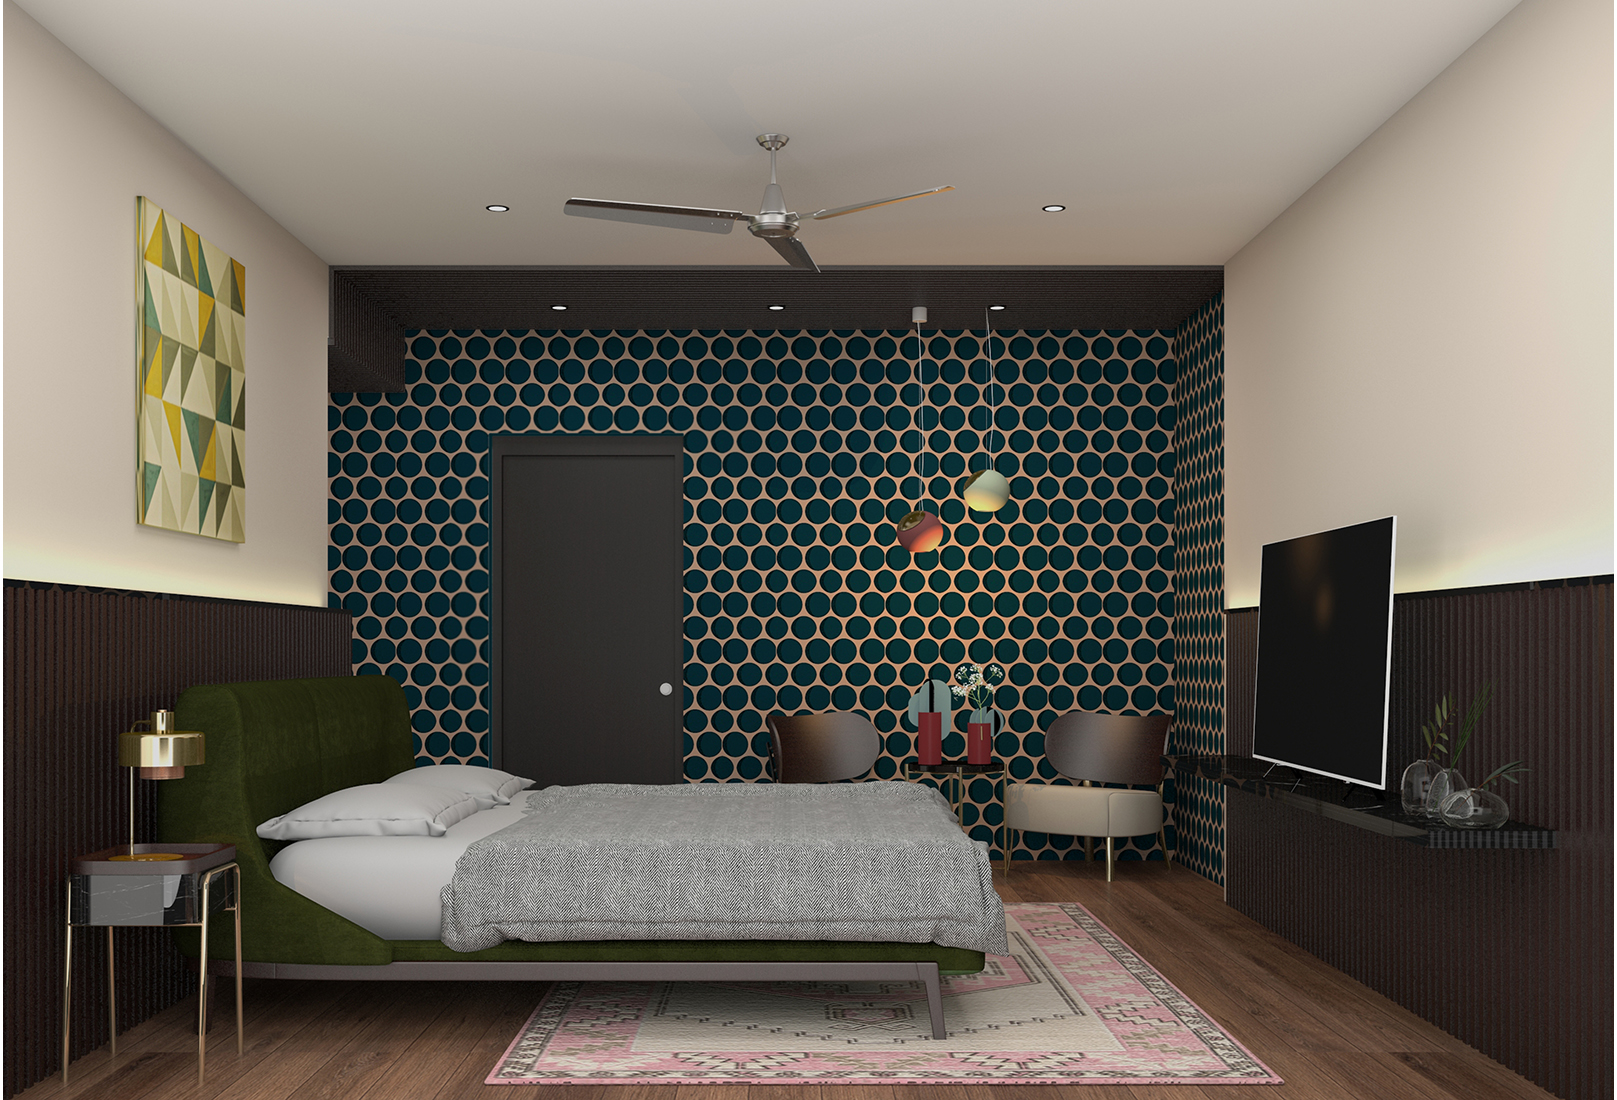 warp architects_svb's interiors (10).jpg